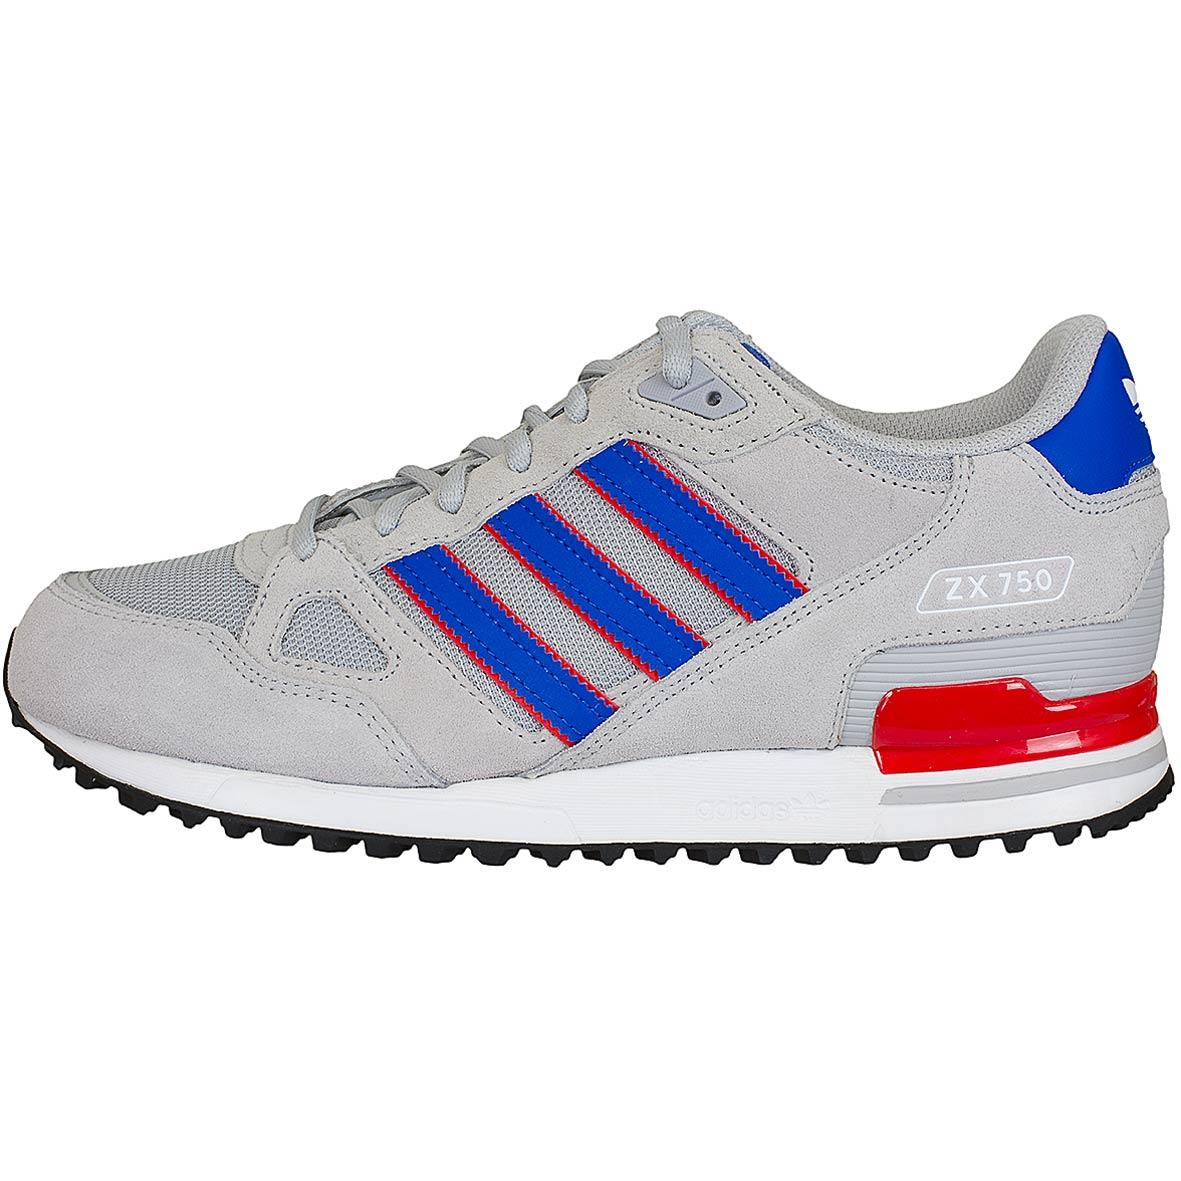 look for best place exclusive shoes ☆ Adidas Originals Sneaker ZX 750 grau/blau - hier bestellen!